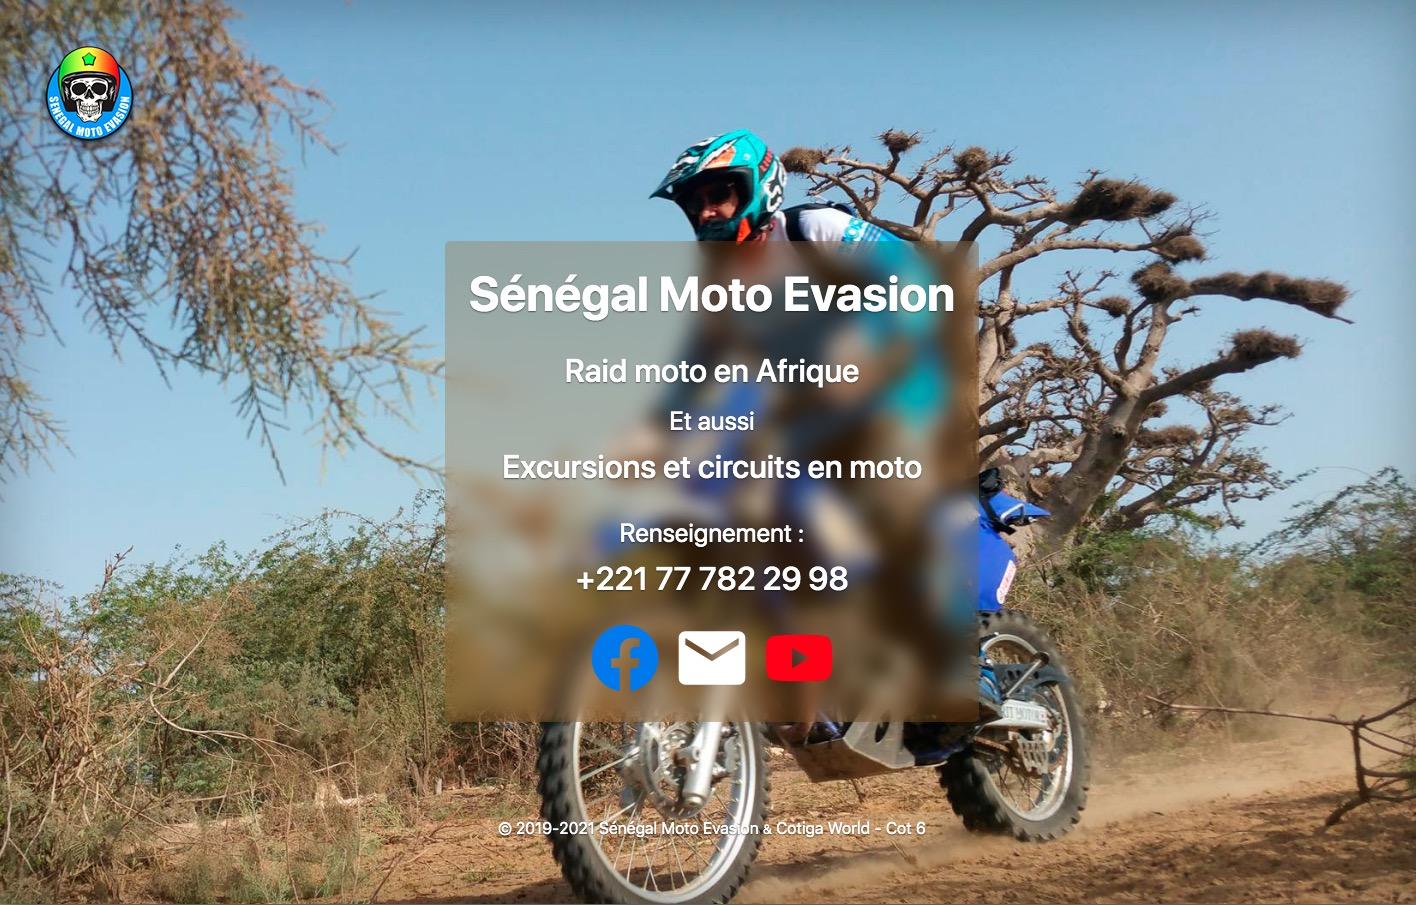 Sénégal Moto Evasion